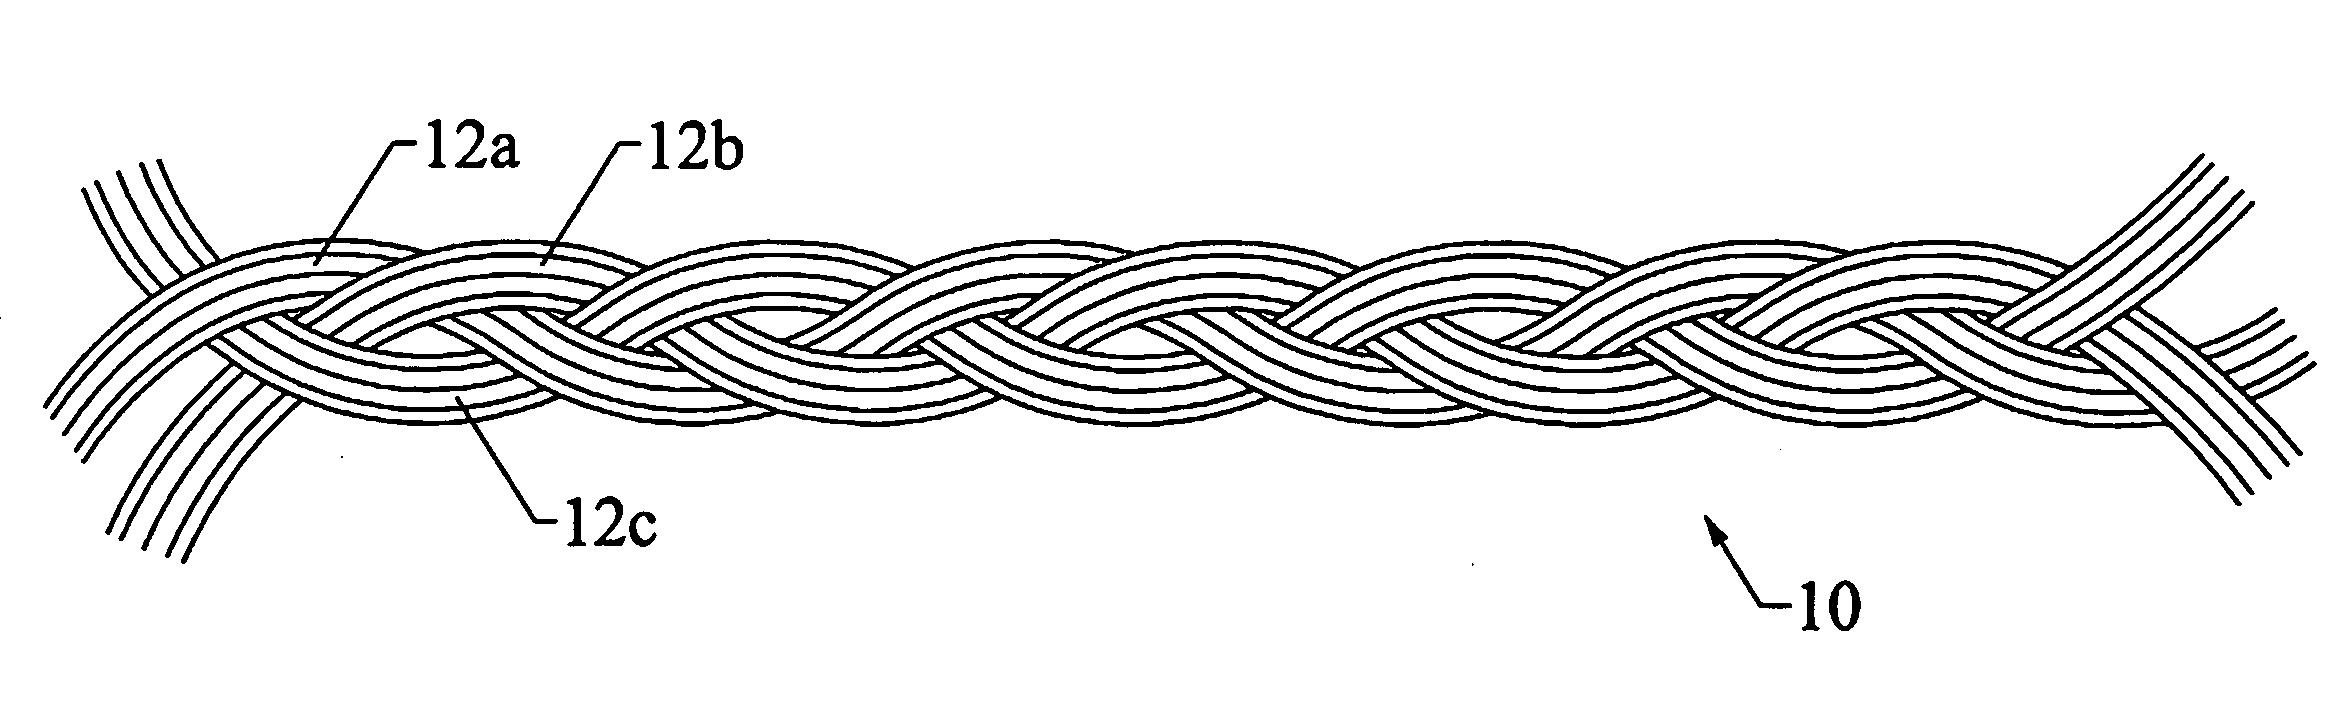 Drawn rope braided rope Patent Drawing handles bag US20090120270